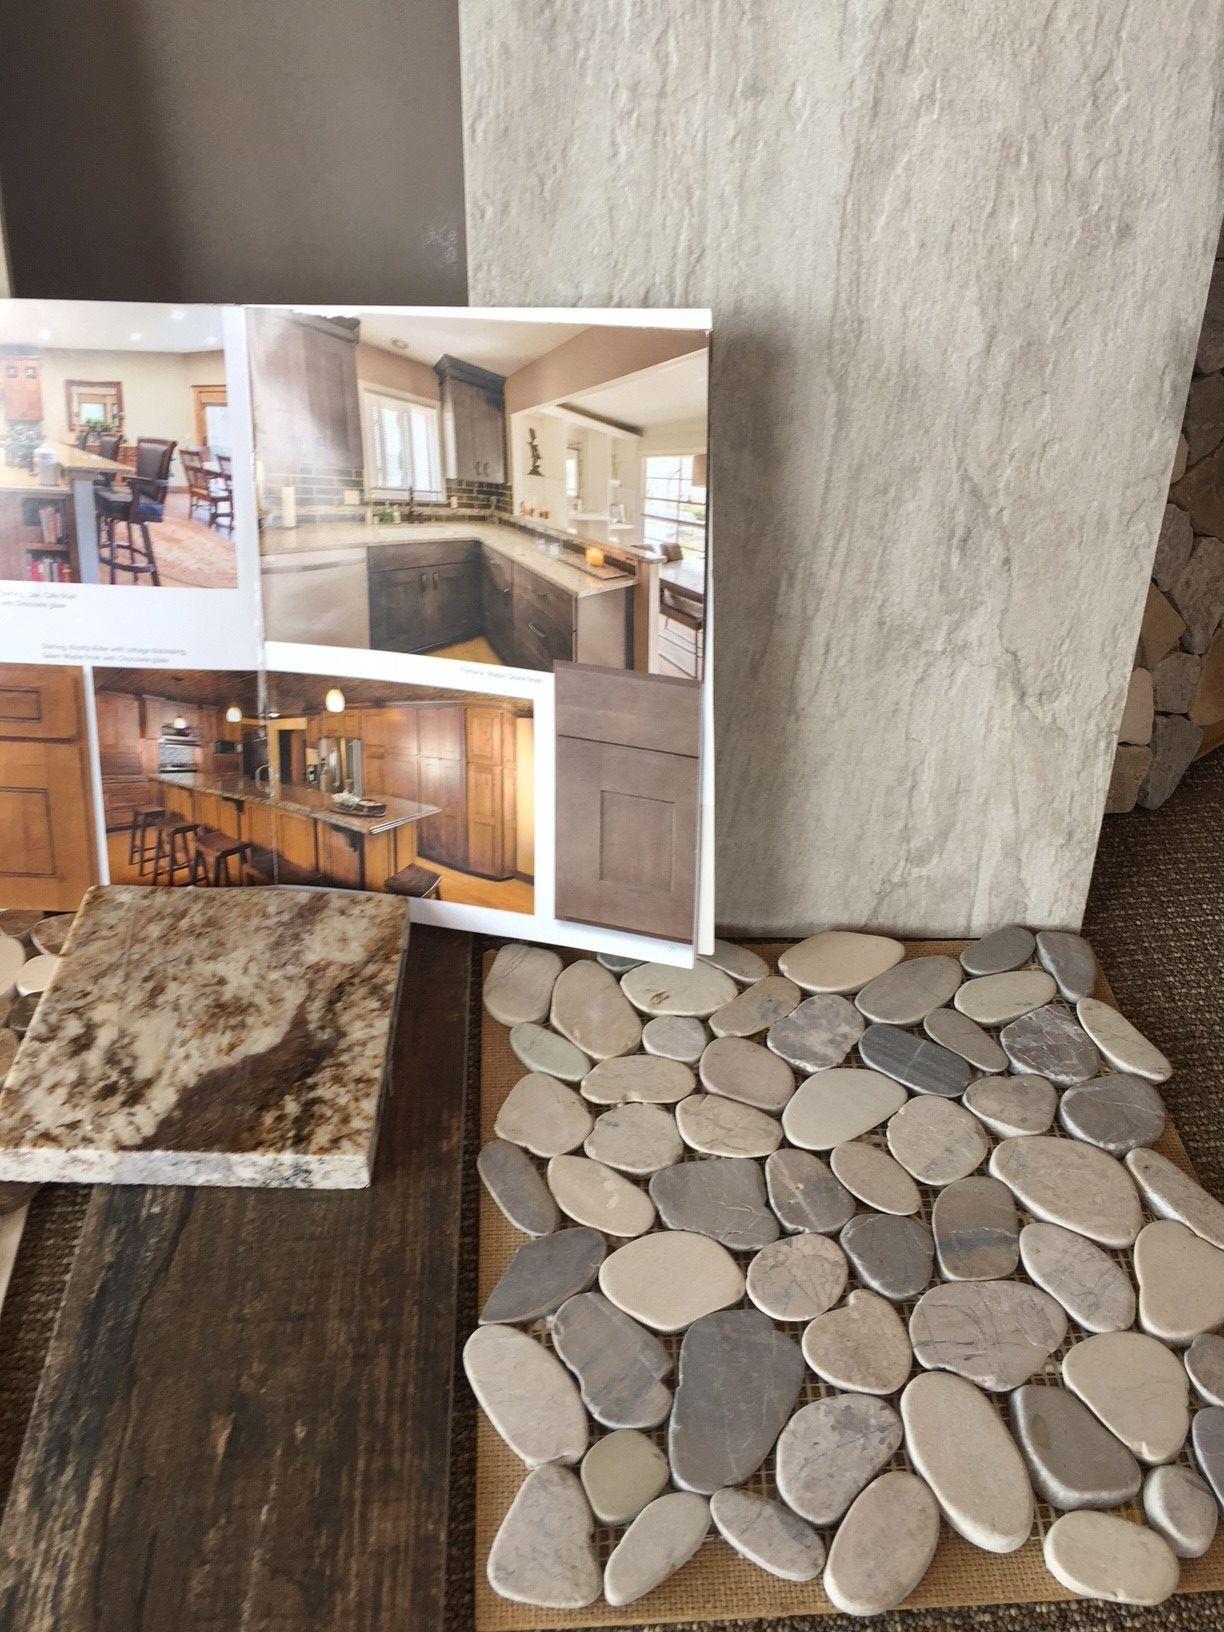 Main Floor Master Bath   Pebble Mosaic For Shower Floor And Recessed Shower  Shelf, Gray